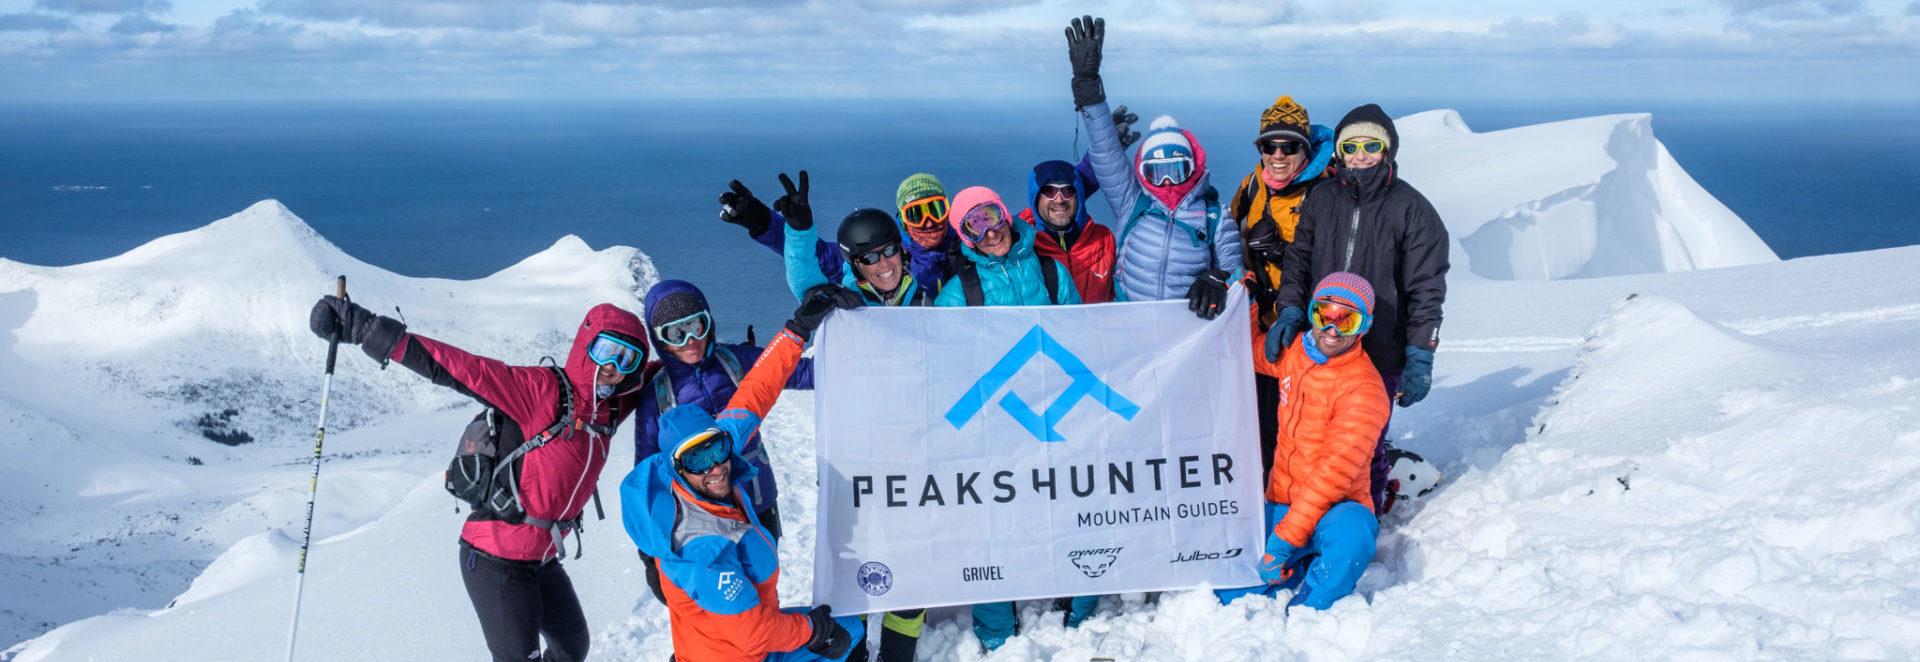 Norway - Ski touring